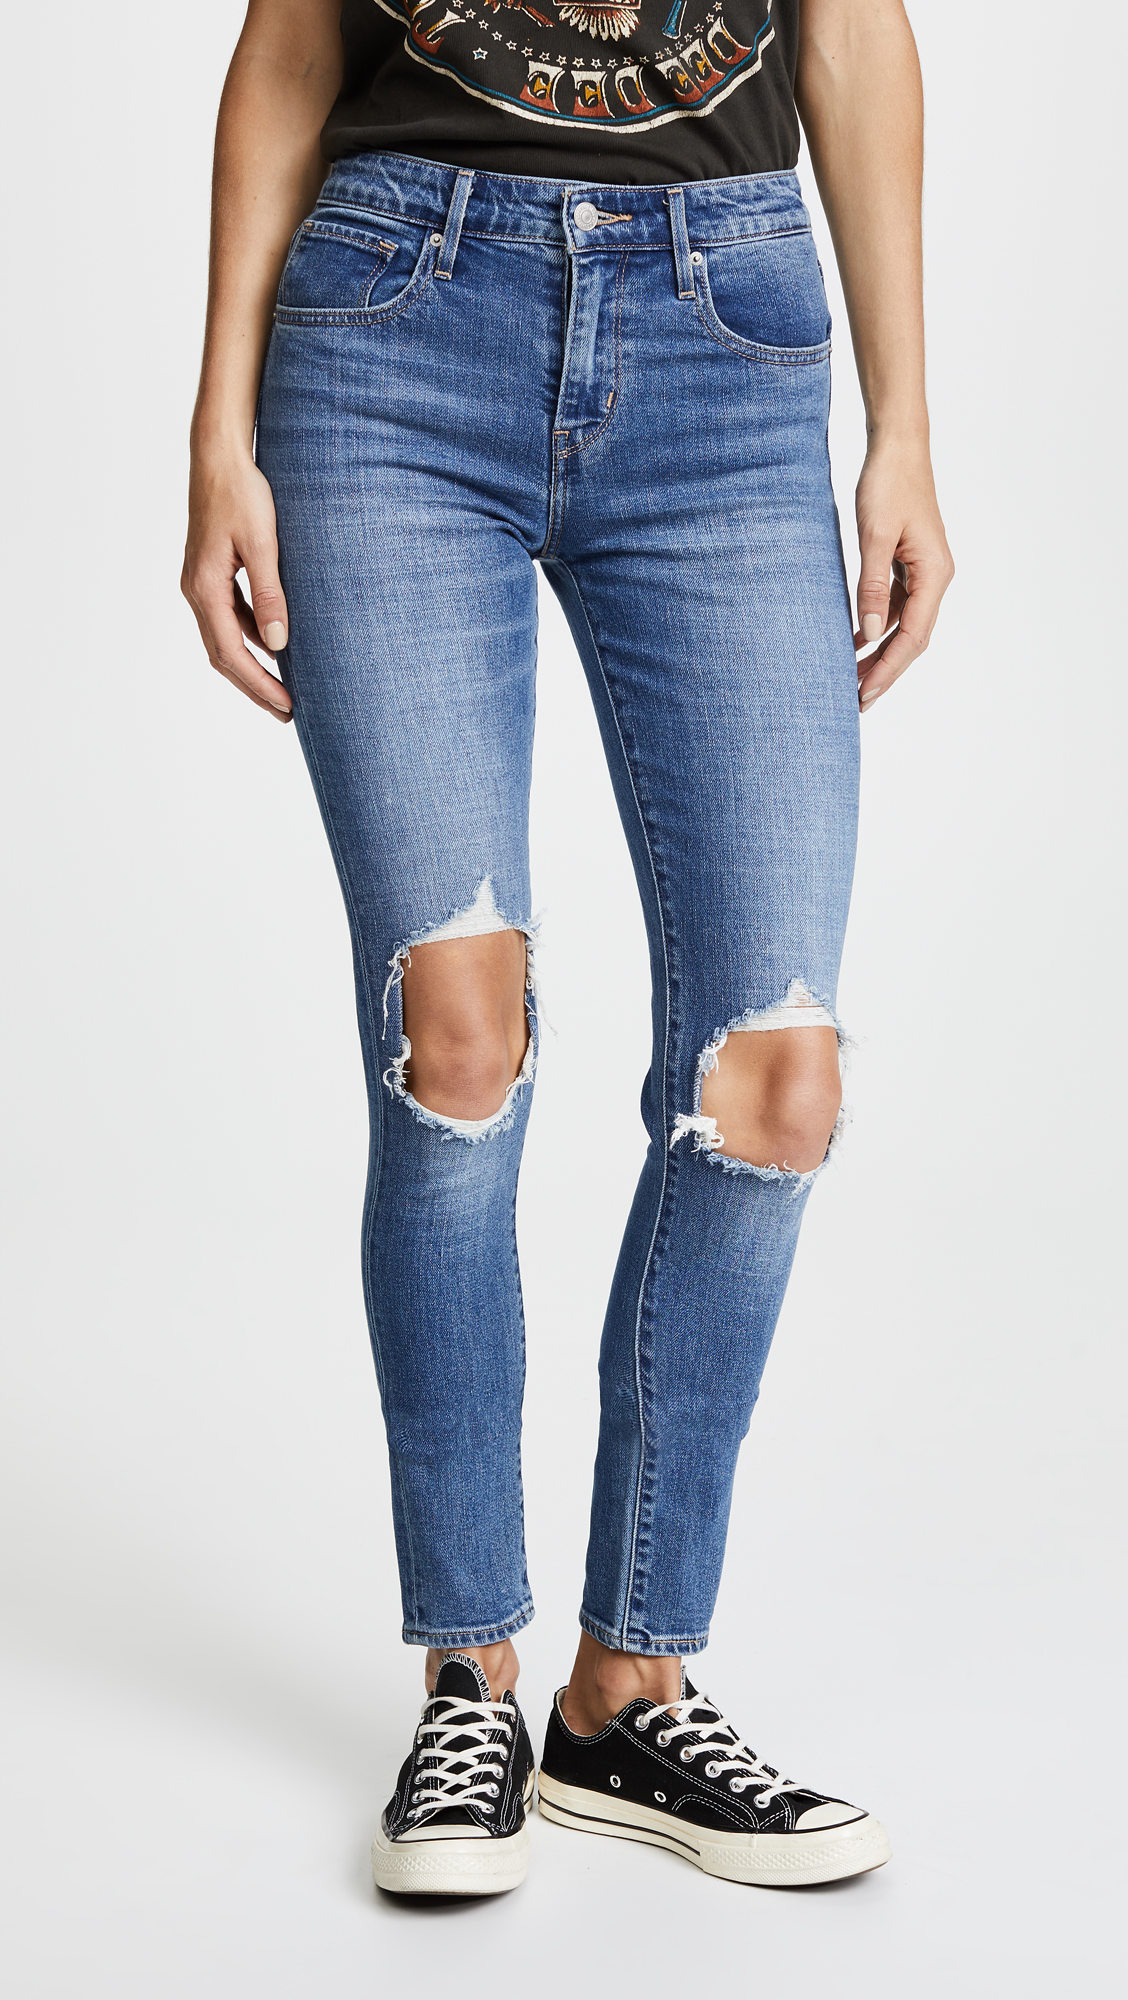 levi's, distressed denim, high rise jeans, skinny jeans